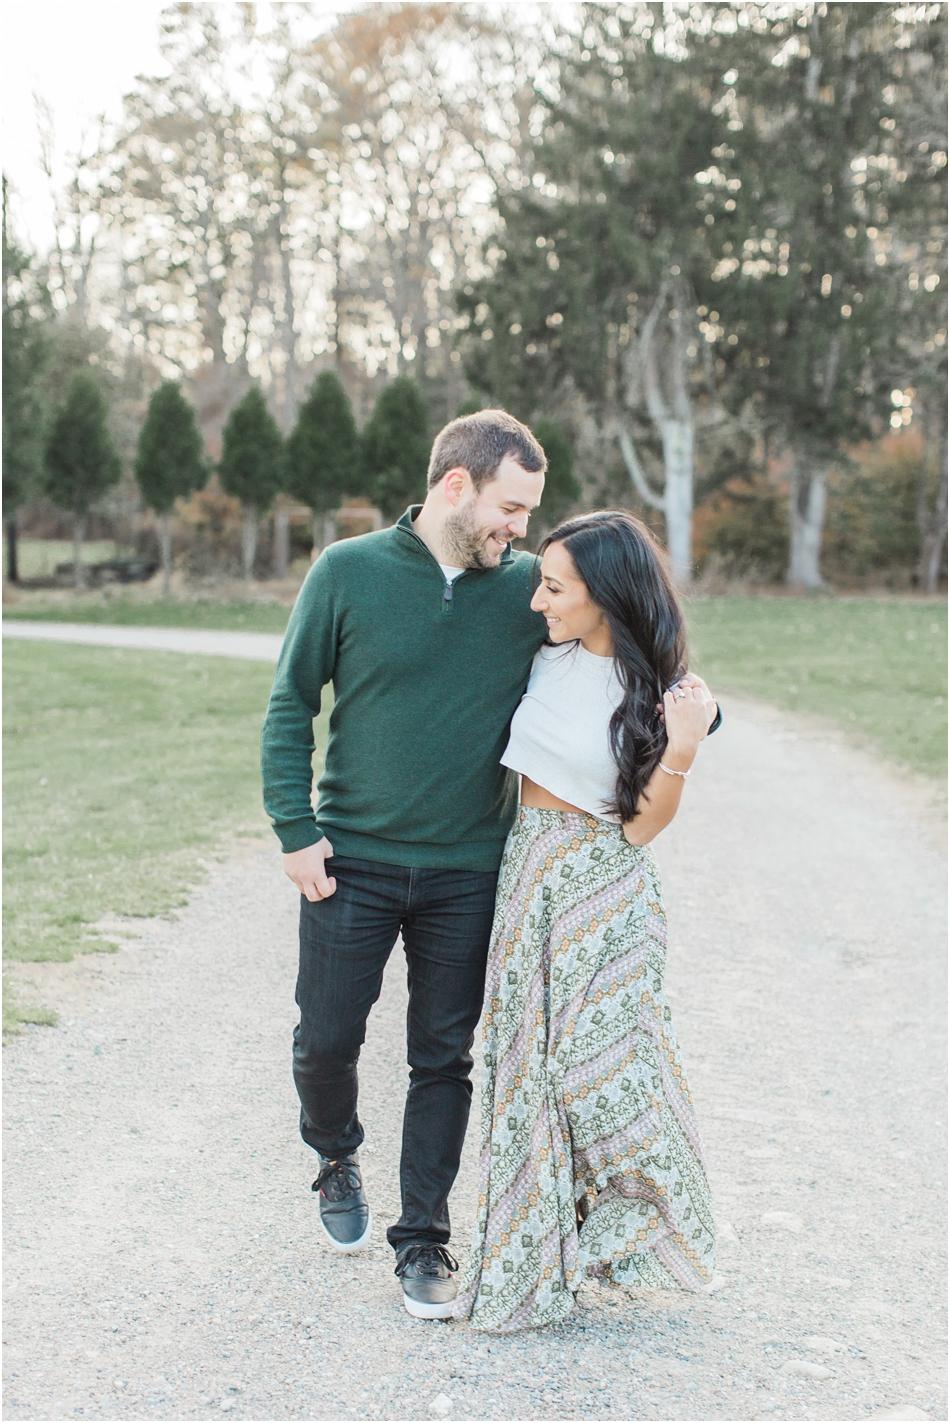 borderland_state_park_engagement_fall_michelle_matt_cape_cod_boston_new_england_wedding_photographer_Meredith_Jane_Photography_photo_0268.jpg